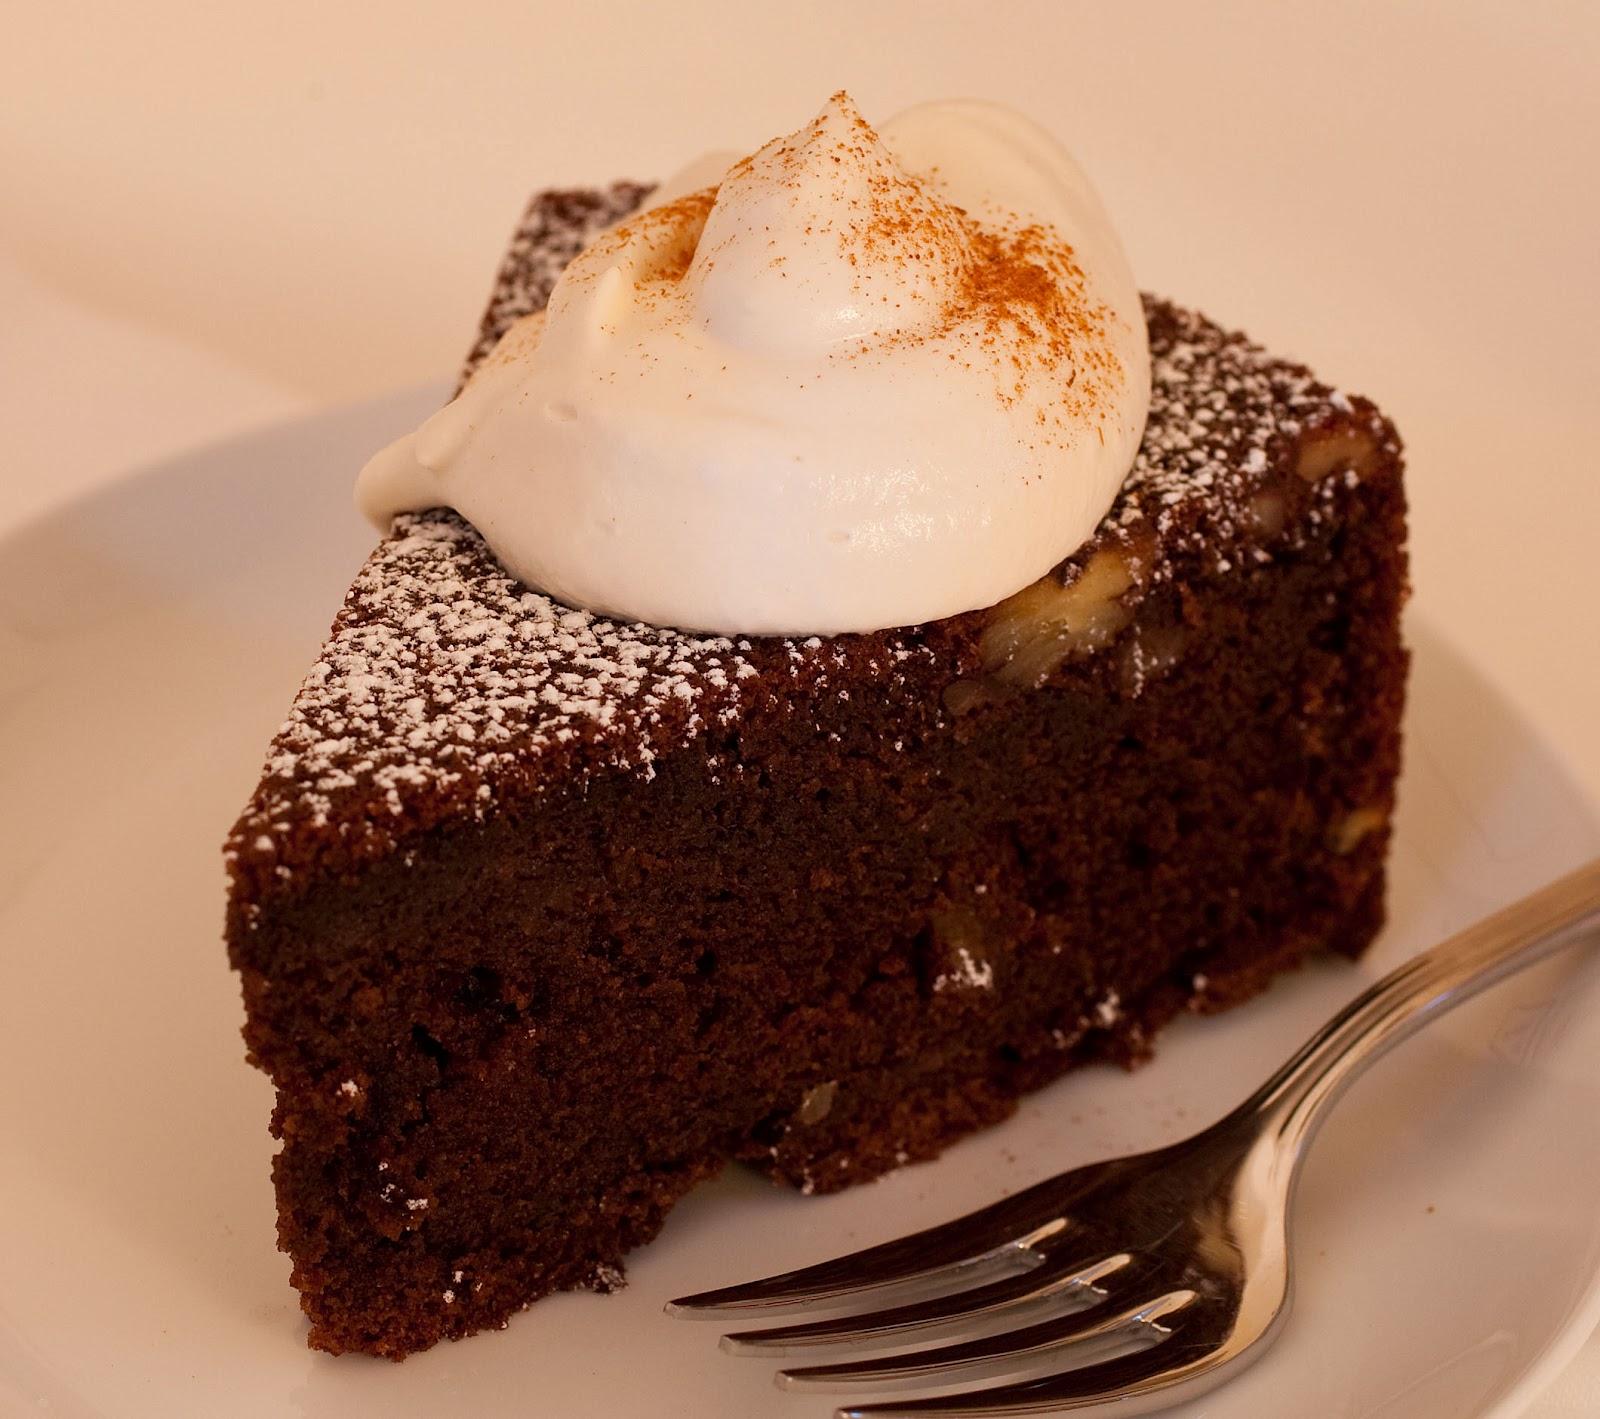 Tish Boyle Sweet Dreams: Chocolate Guinness Cake – St. Patrick's ...